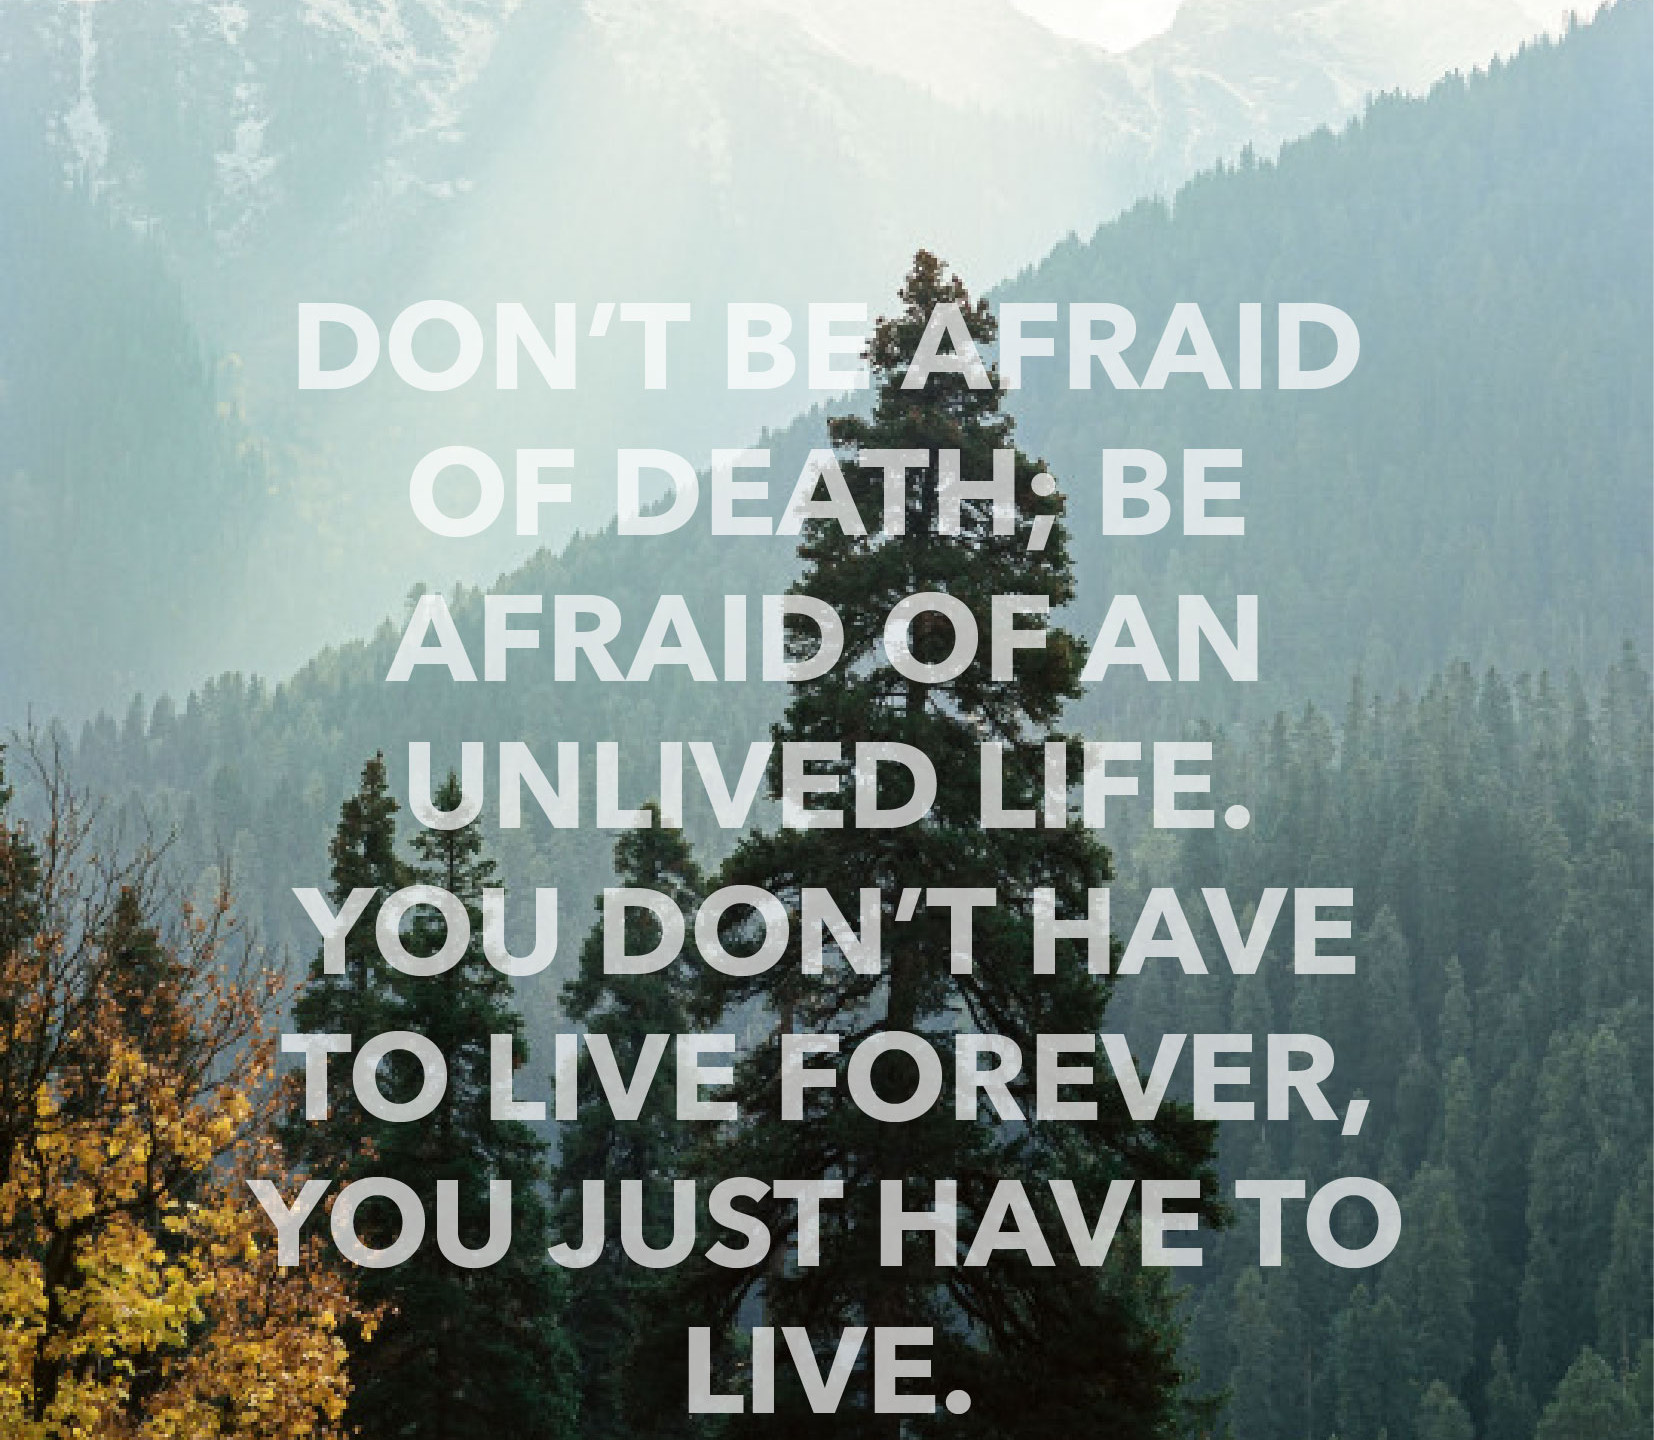 Afraid-of death-myowneulogy